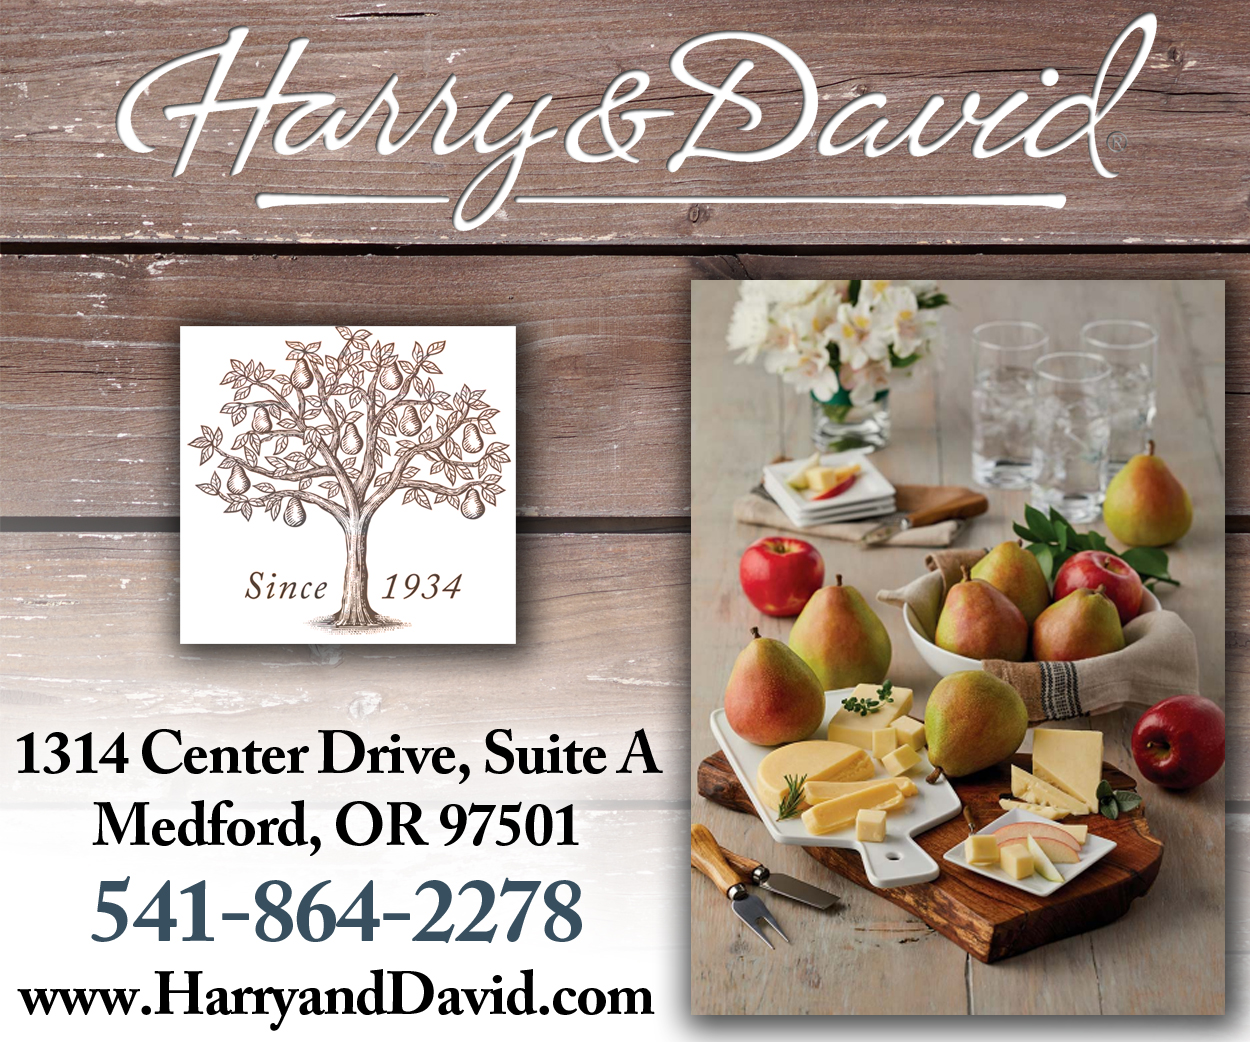 Harry & David Banner Ad